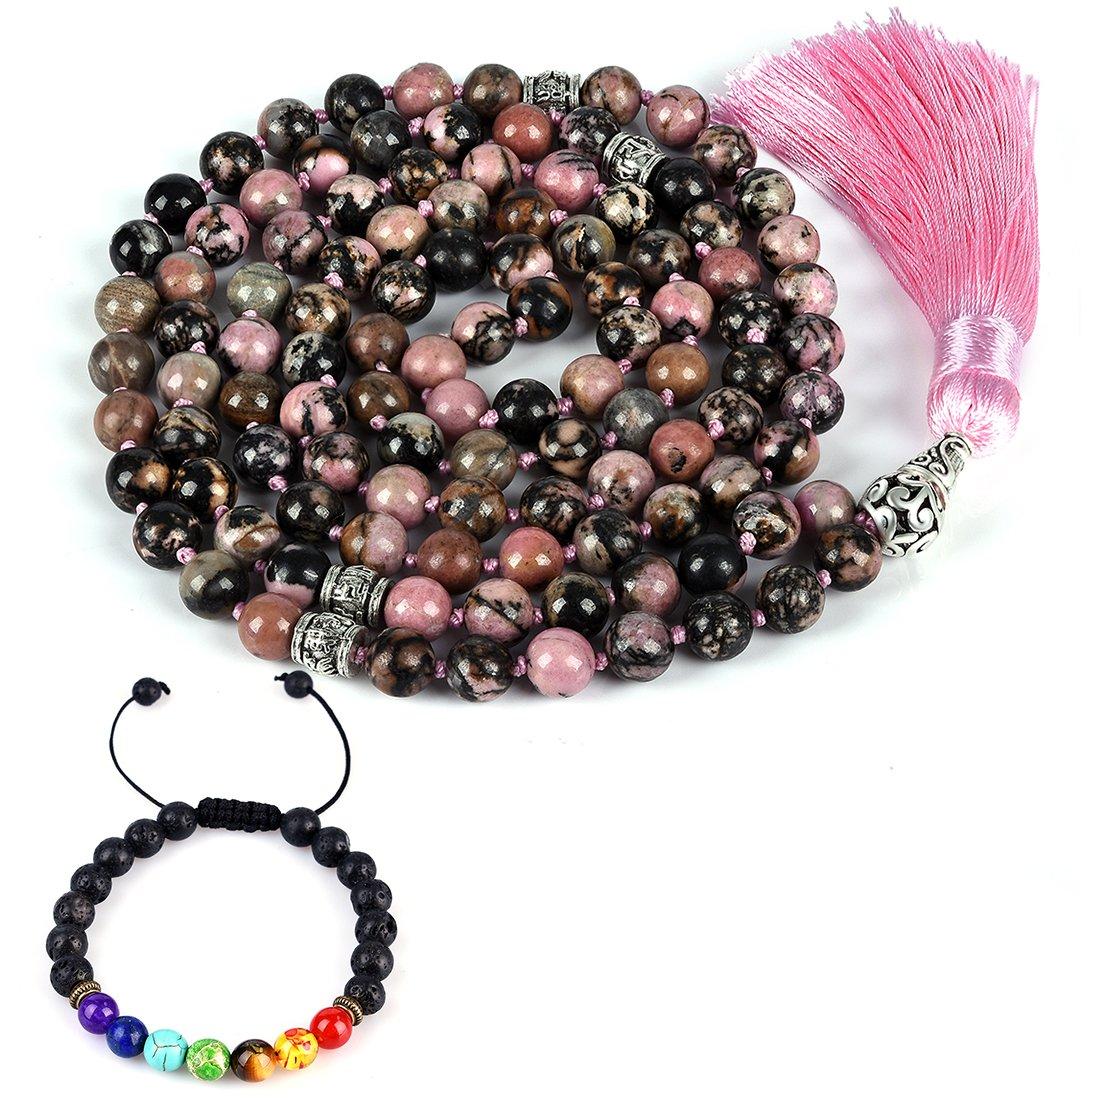 CAT EYE JEWELS 8mm Mala Beads Necklace Yoga Meditation 108 Hand Knotted Natural Stone Japa Mala Buddhist Prayer Beads Tassel Necklace Healing Lava Rock Beads Diffuser Bracelet MBN-BA002